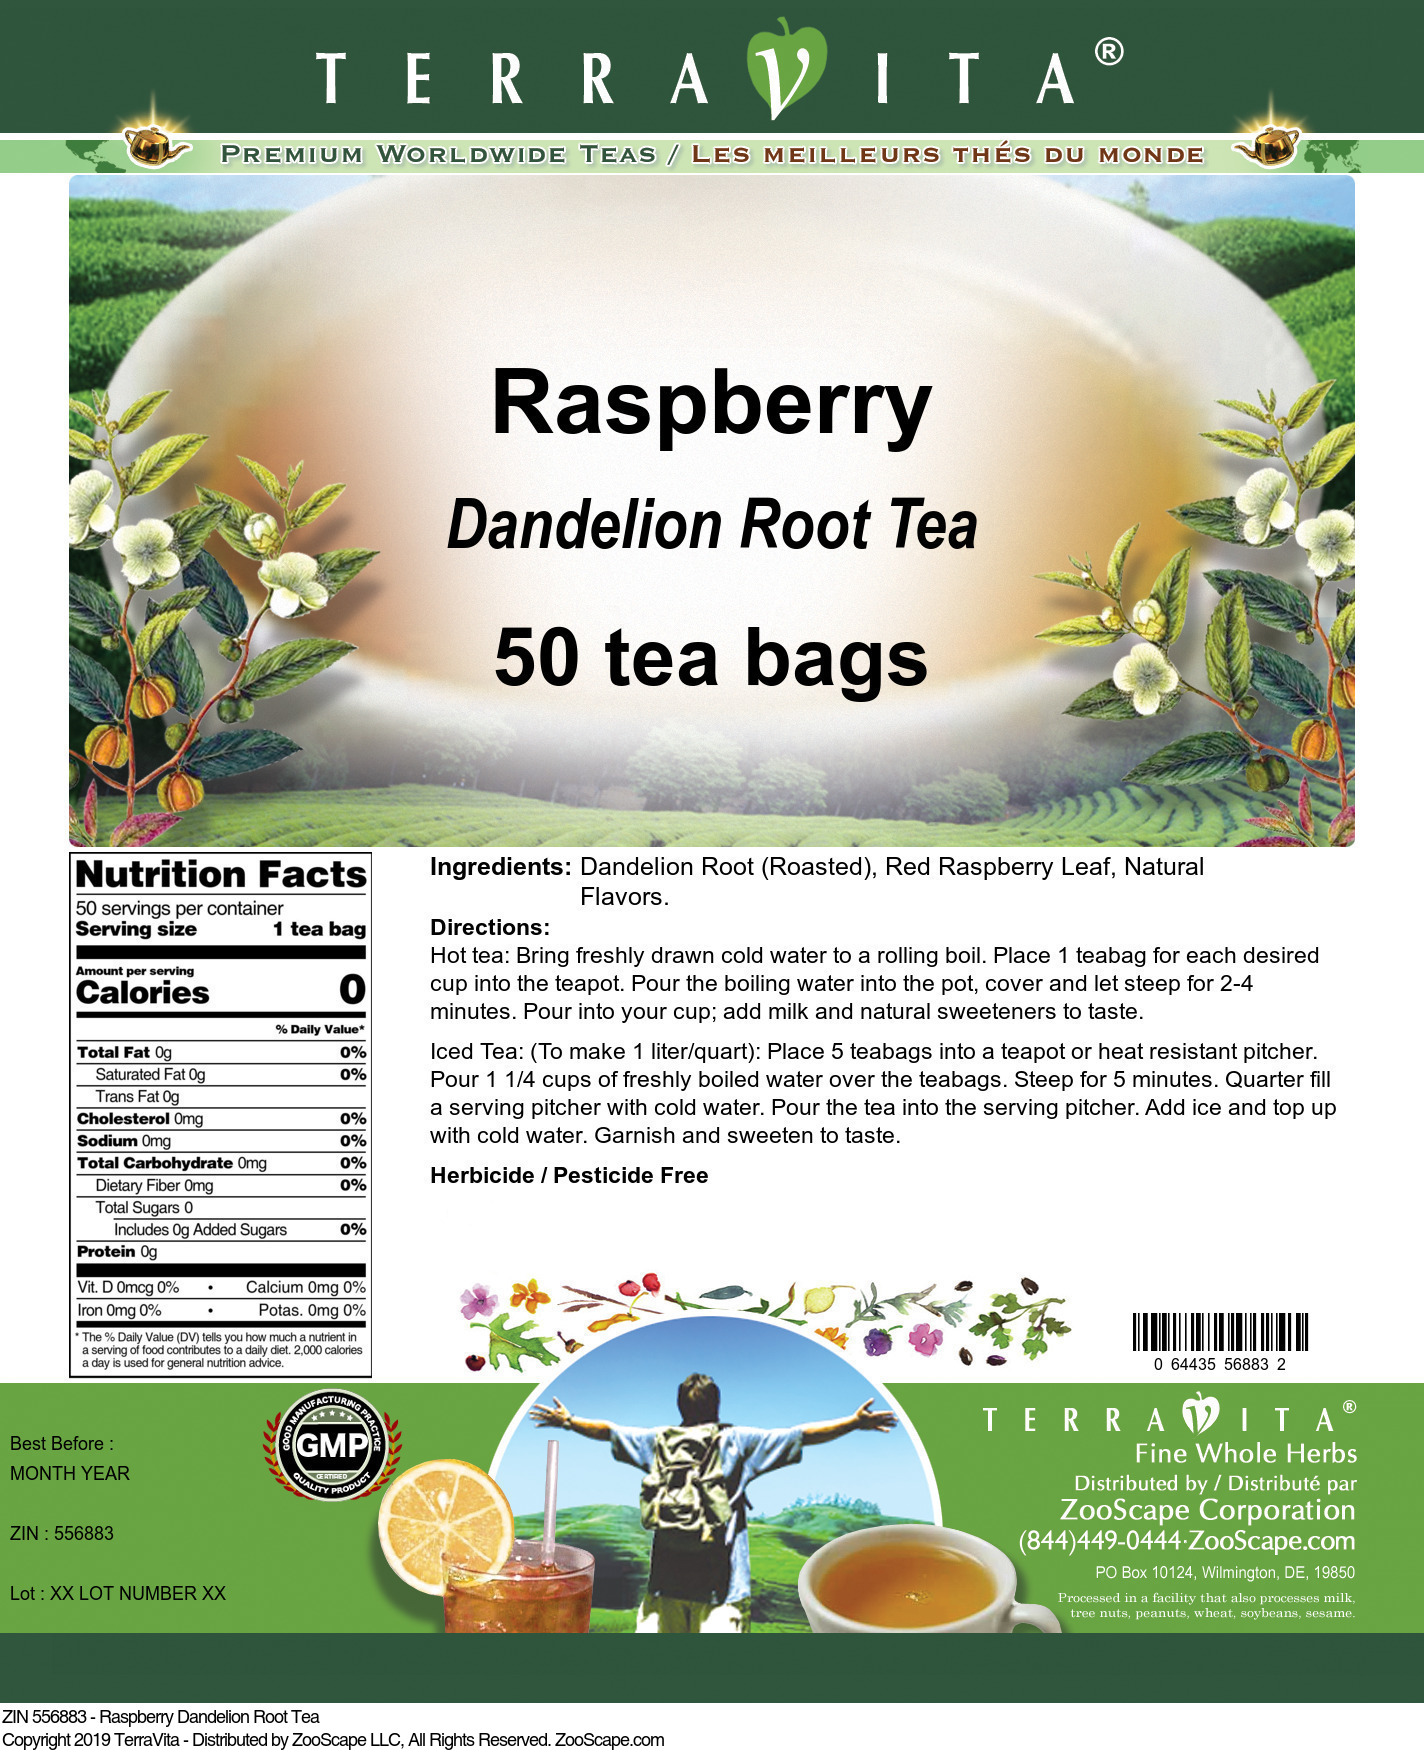 Raspberry Dandelion Root Tea